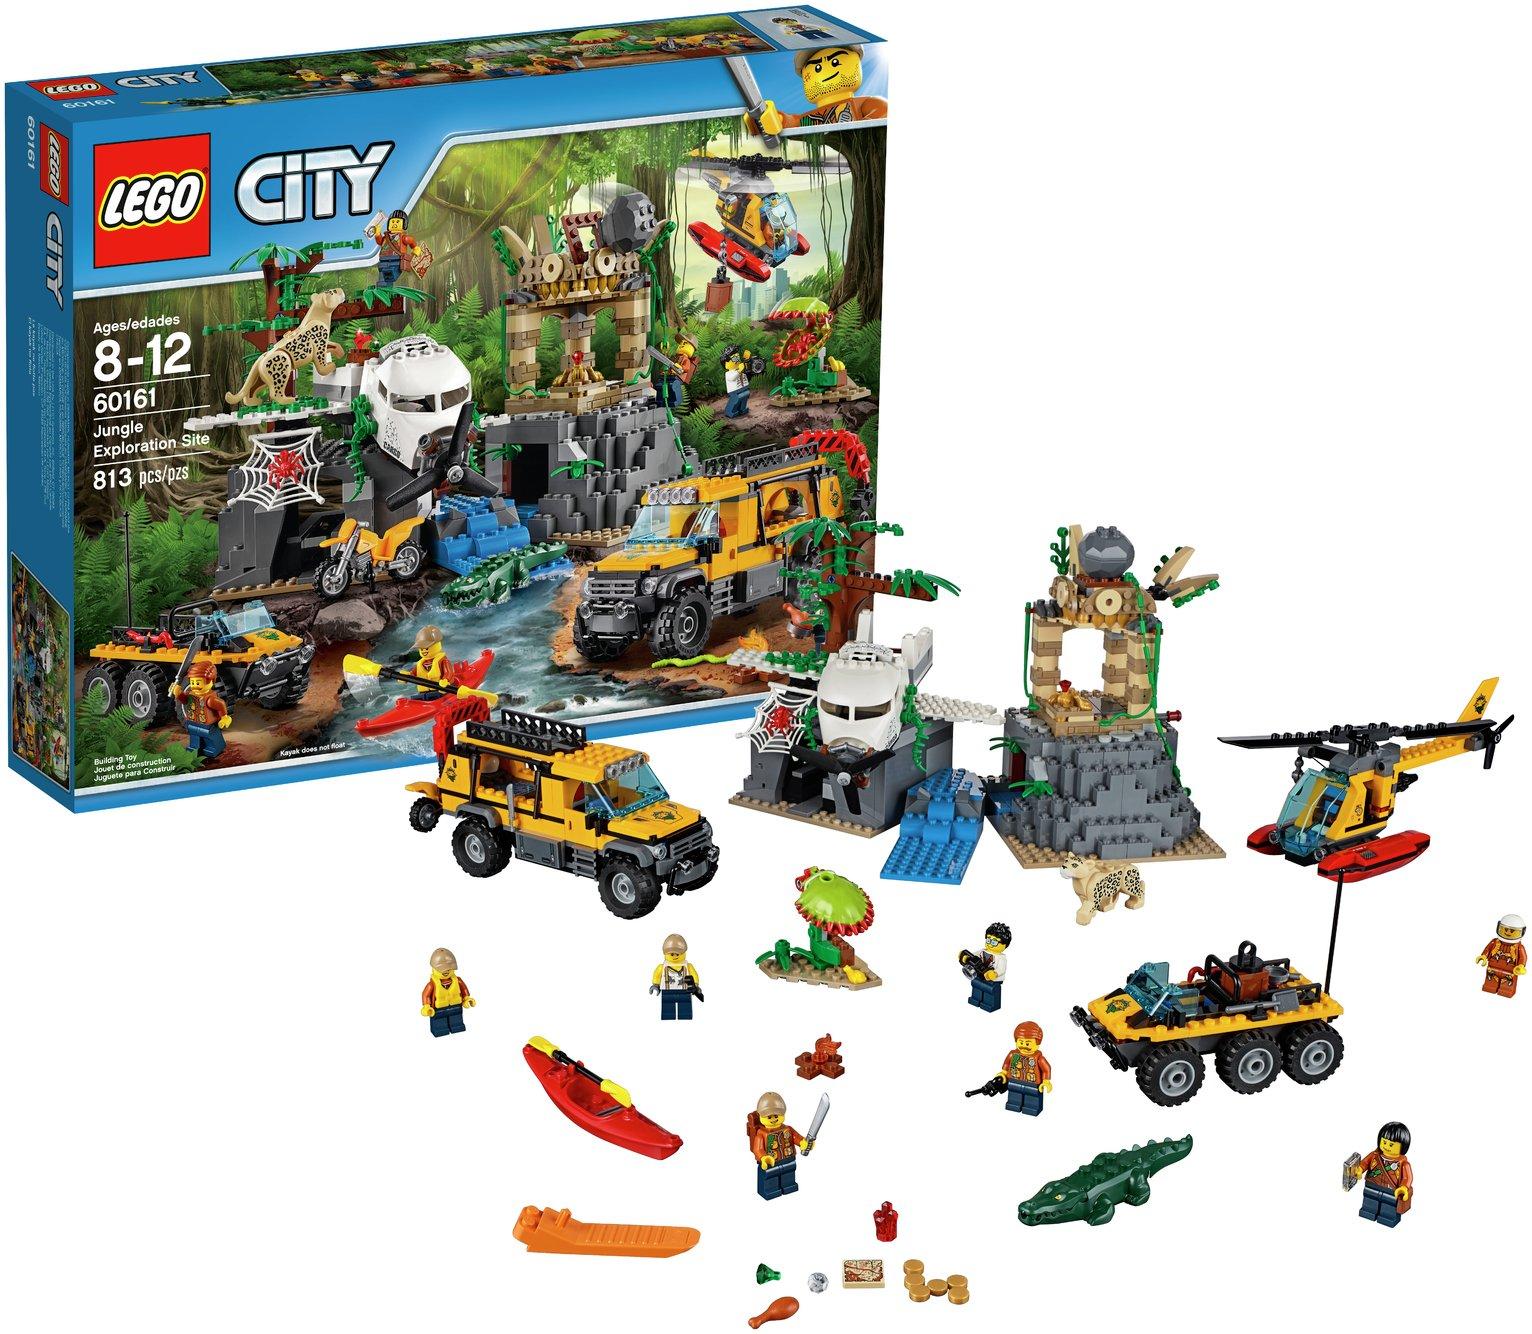 Buy LEGO City Jungle Exploration Site - 60161   LEGO   Argos